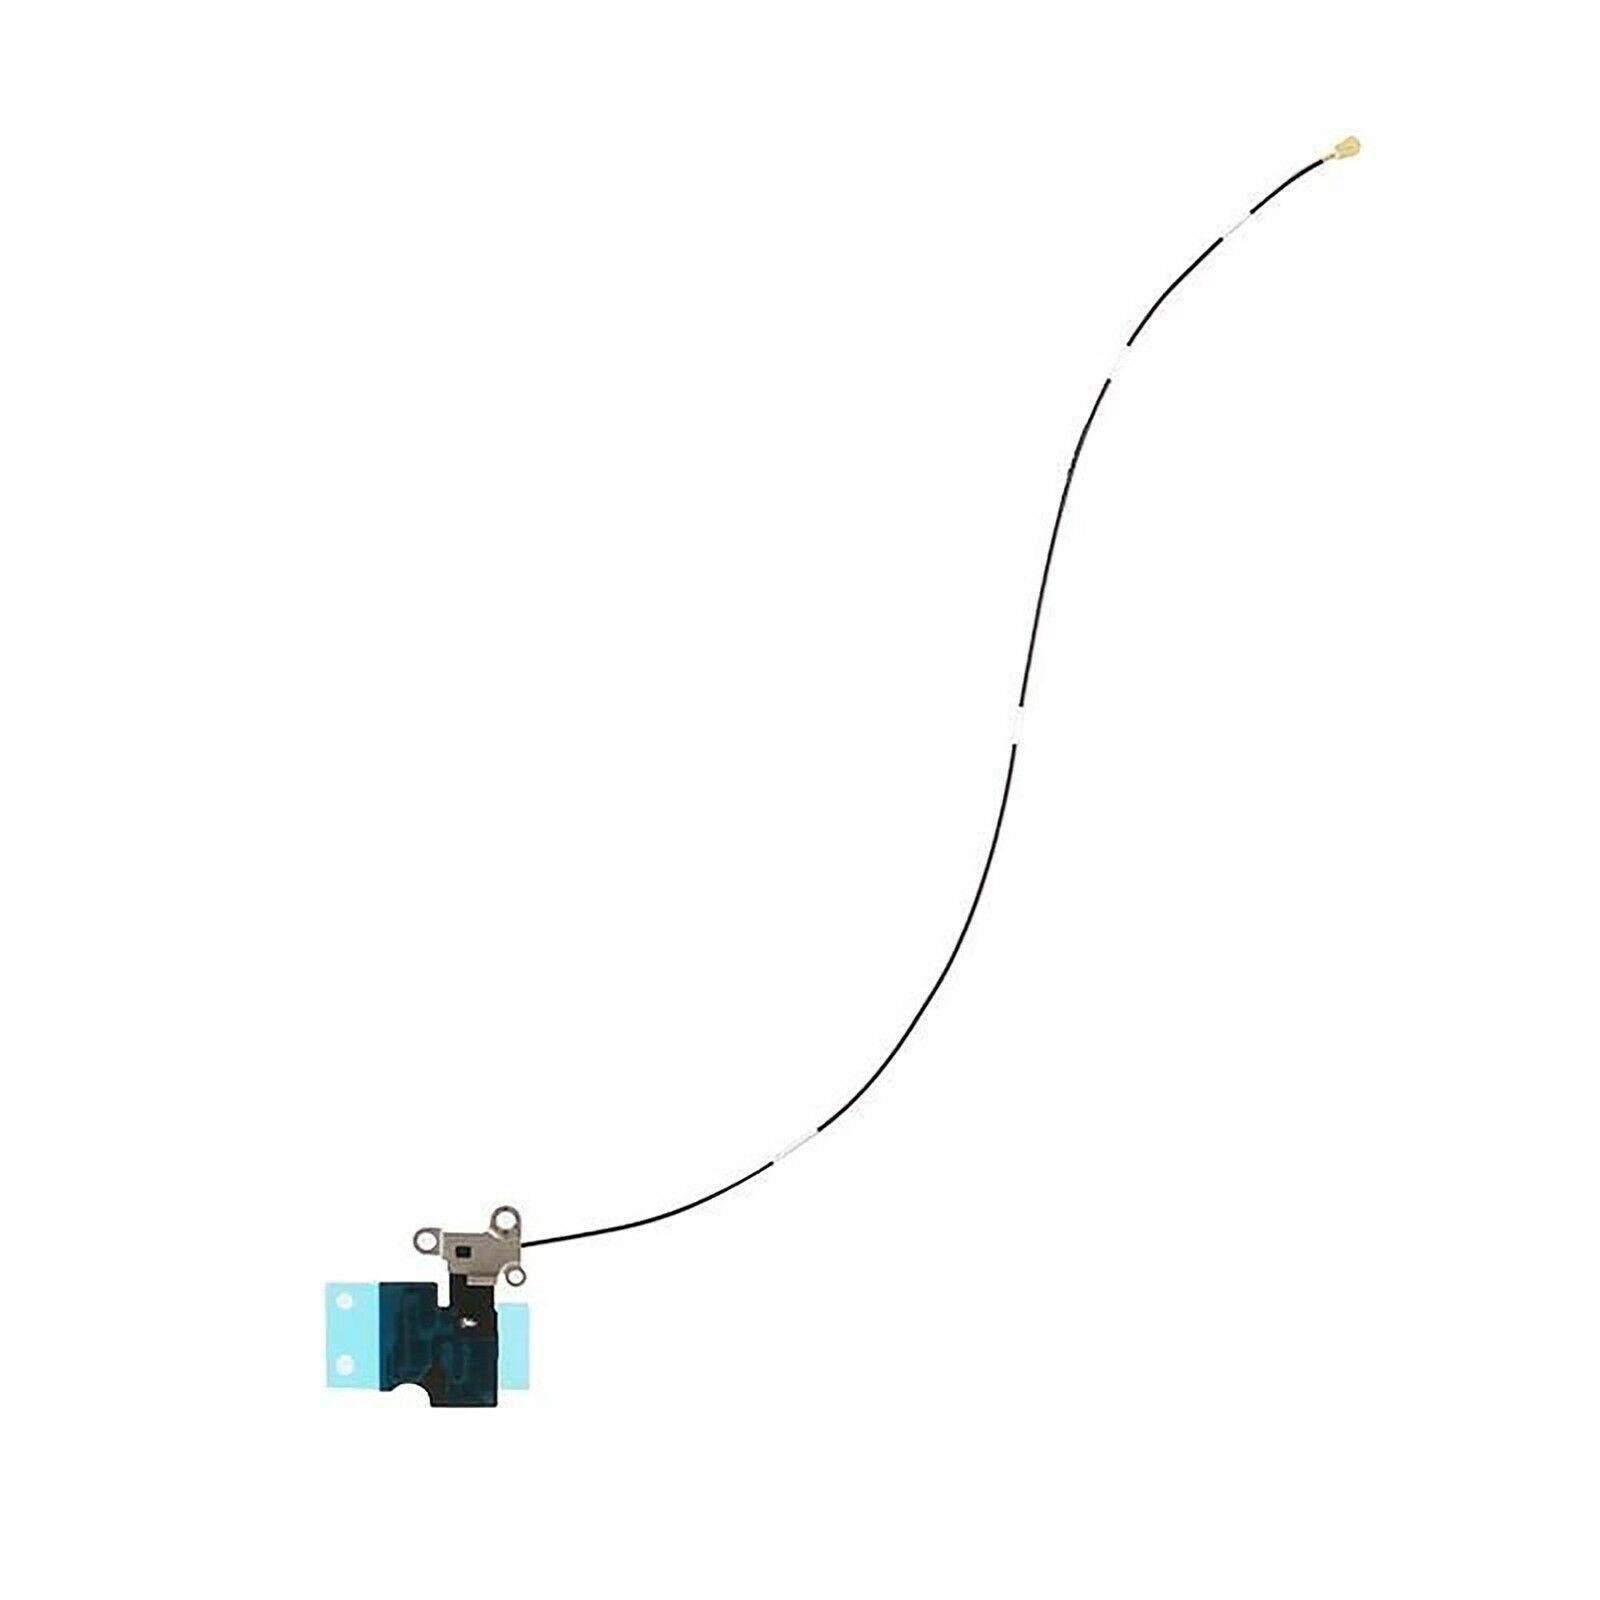 https://www.mondonotebook.it/3892/apple-iphone-6s-plus-modulo-antenna-wifi-flat-antenna-flex-coaxial-cable.jpg